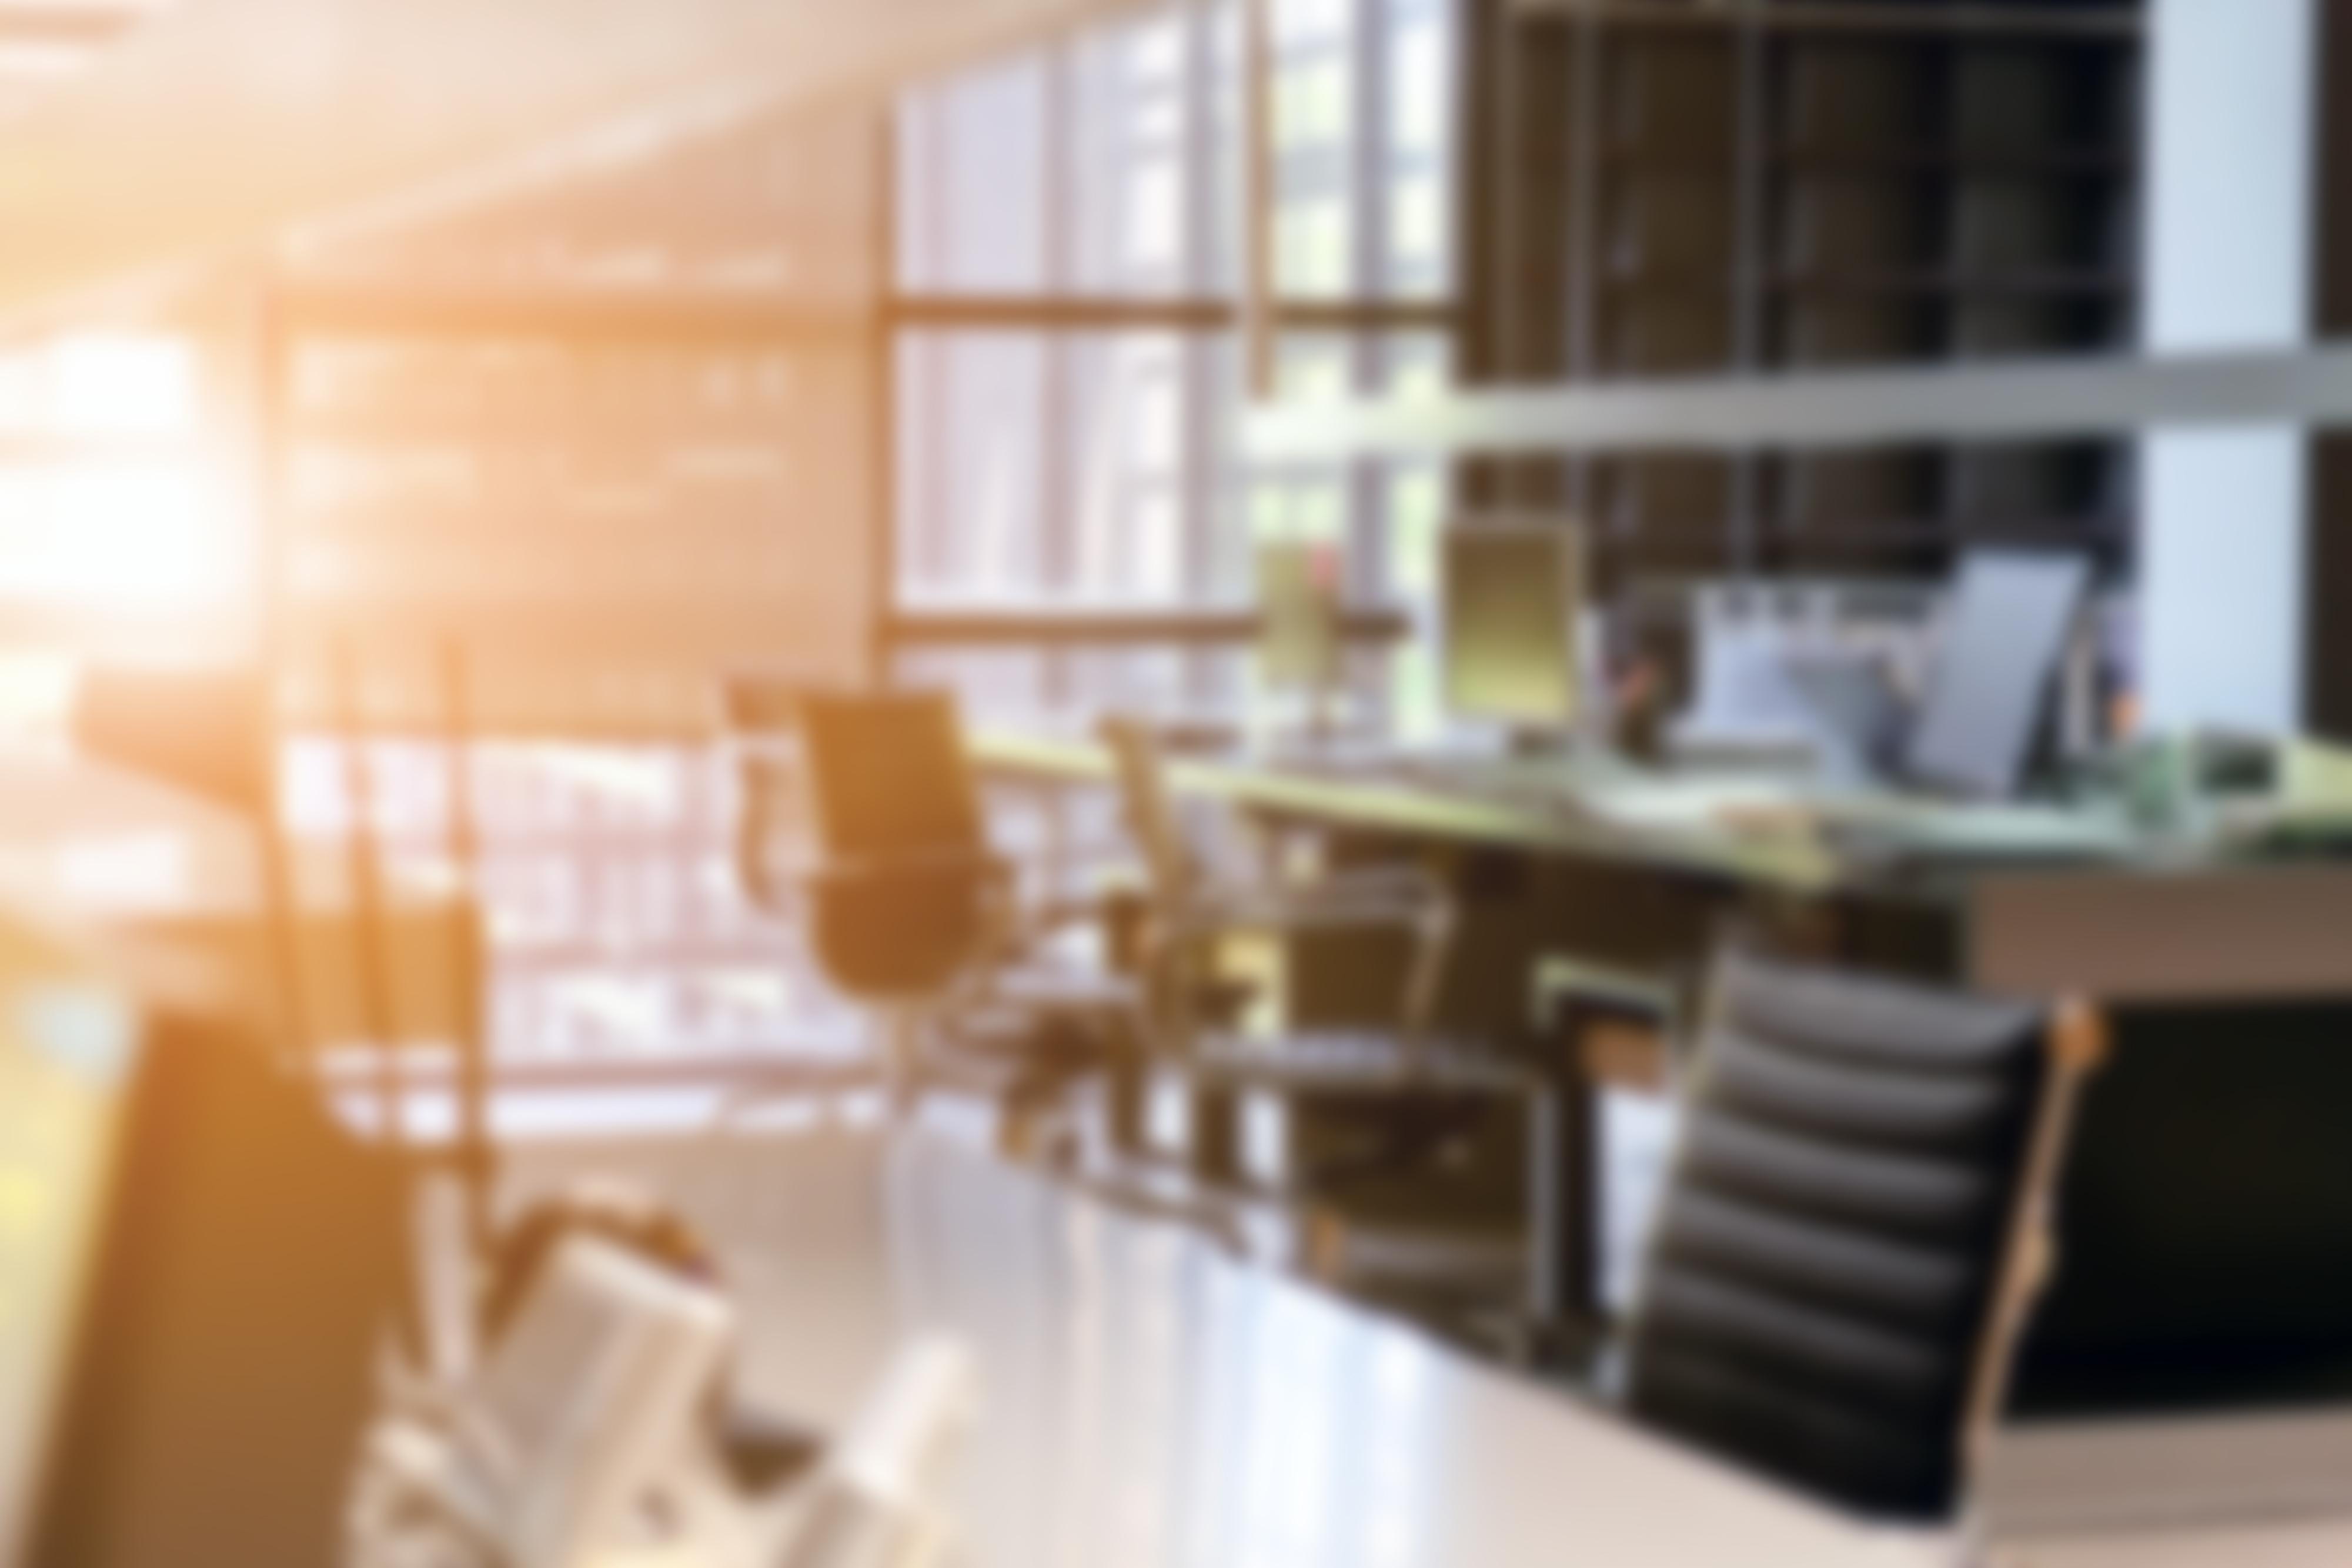 Abstract blur modern office interior background